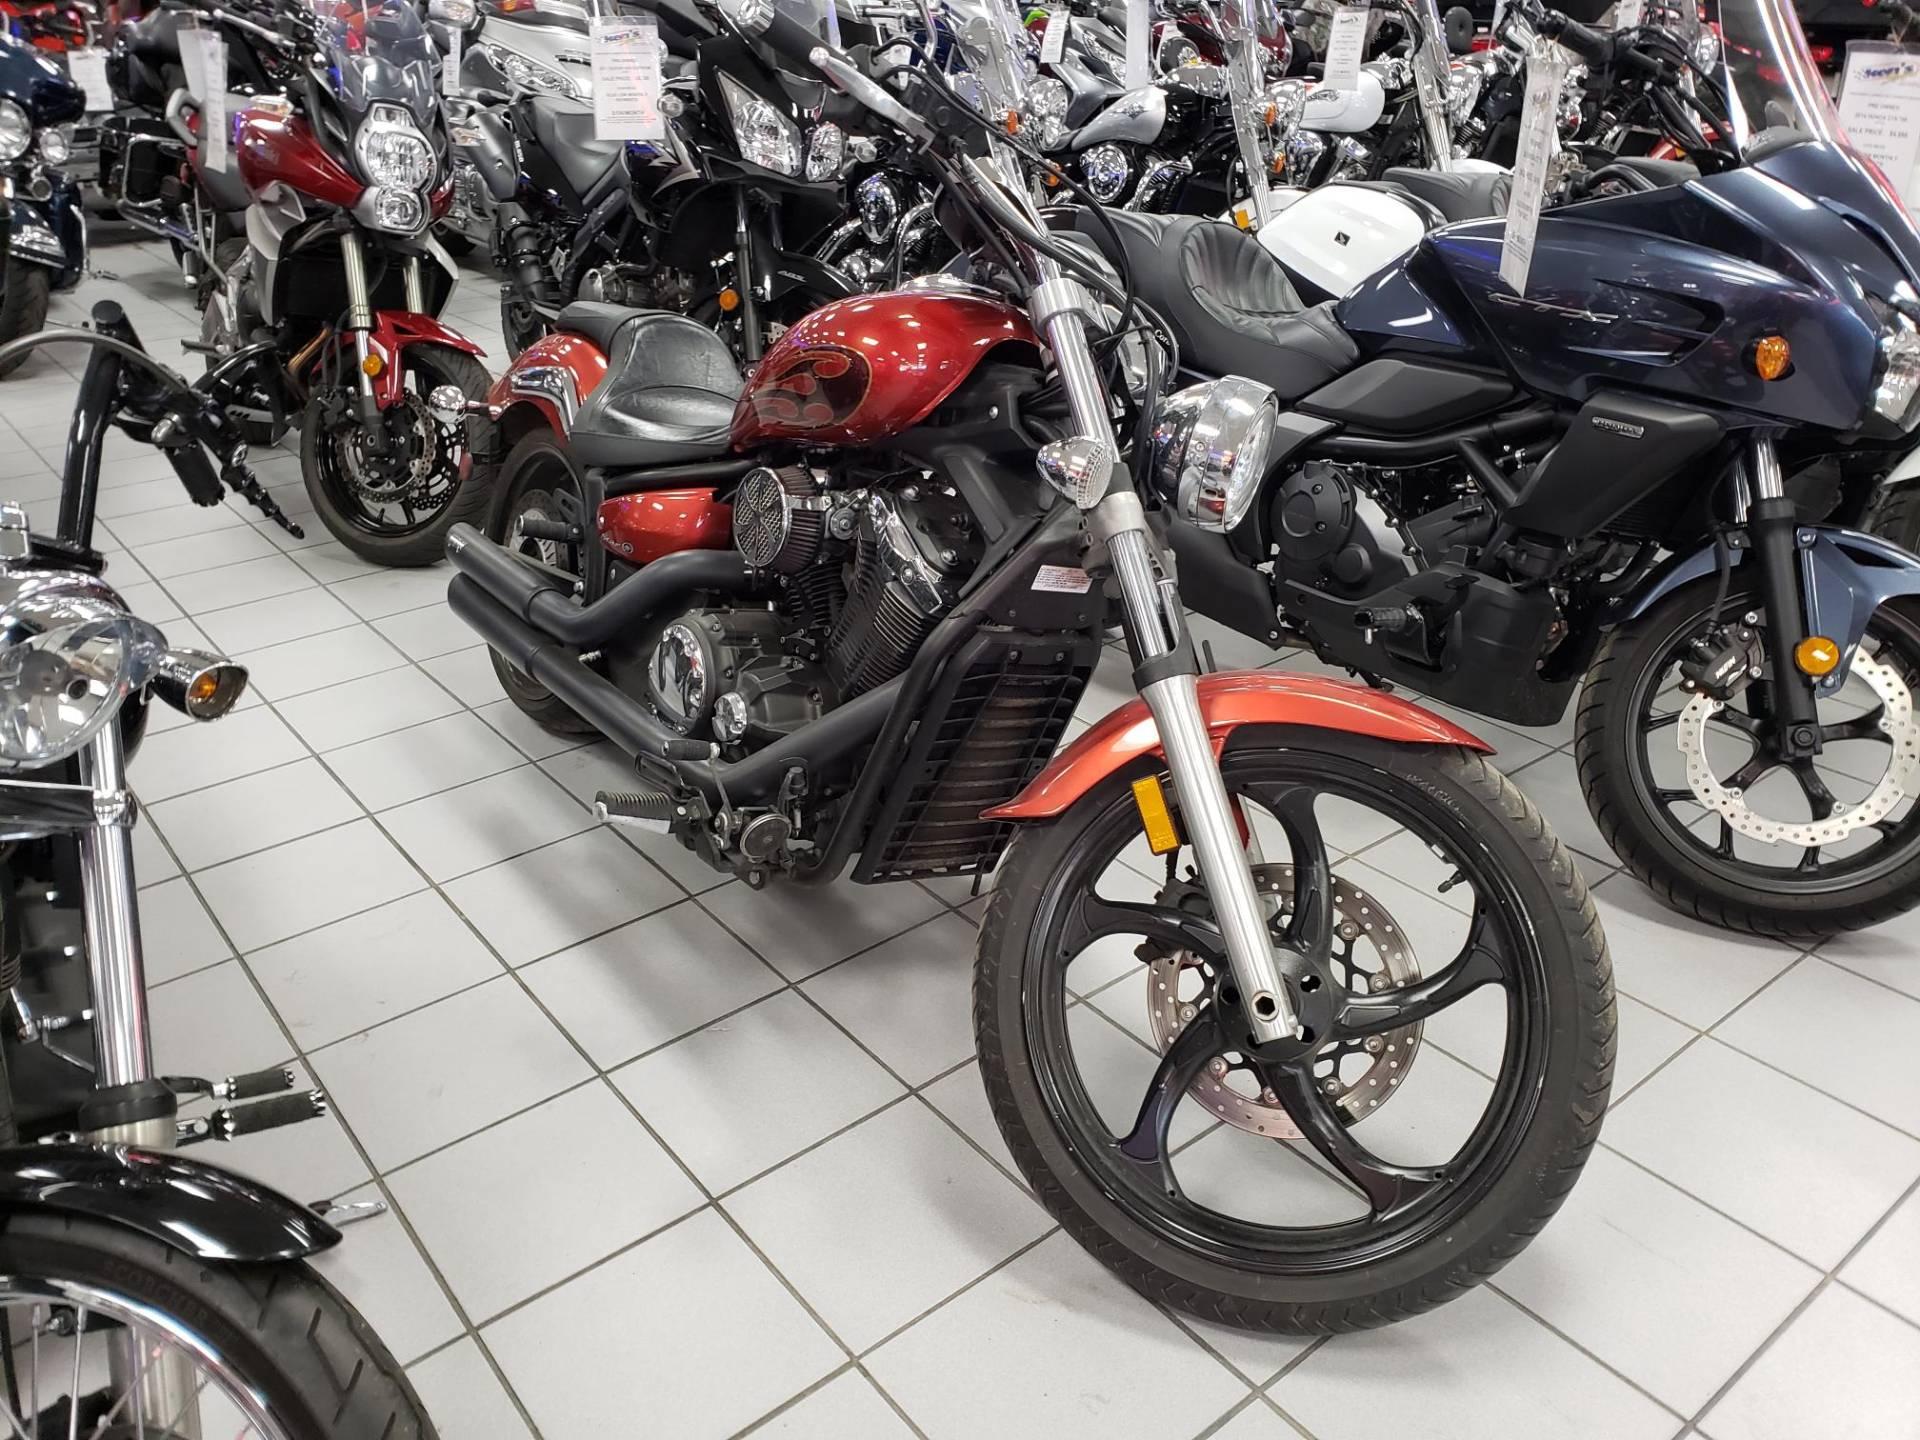 2011 Yamaha Stryker for sale 109078